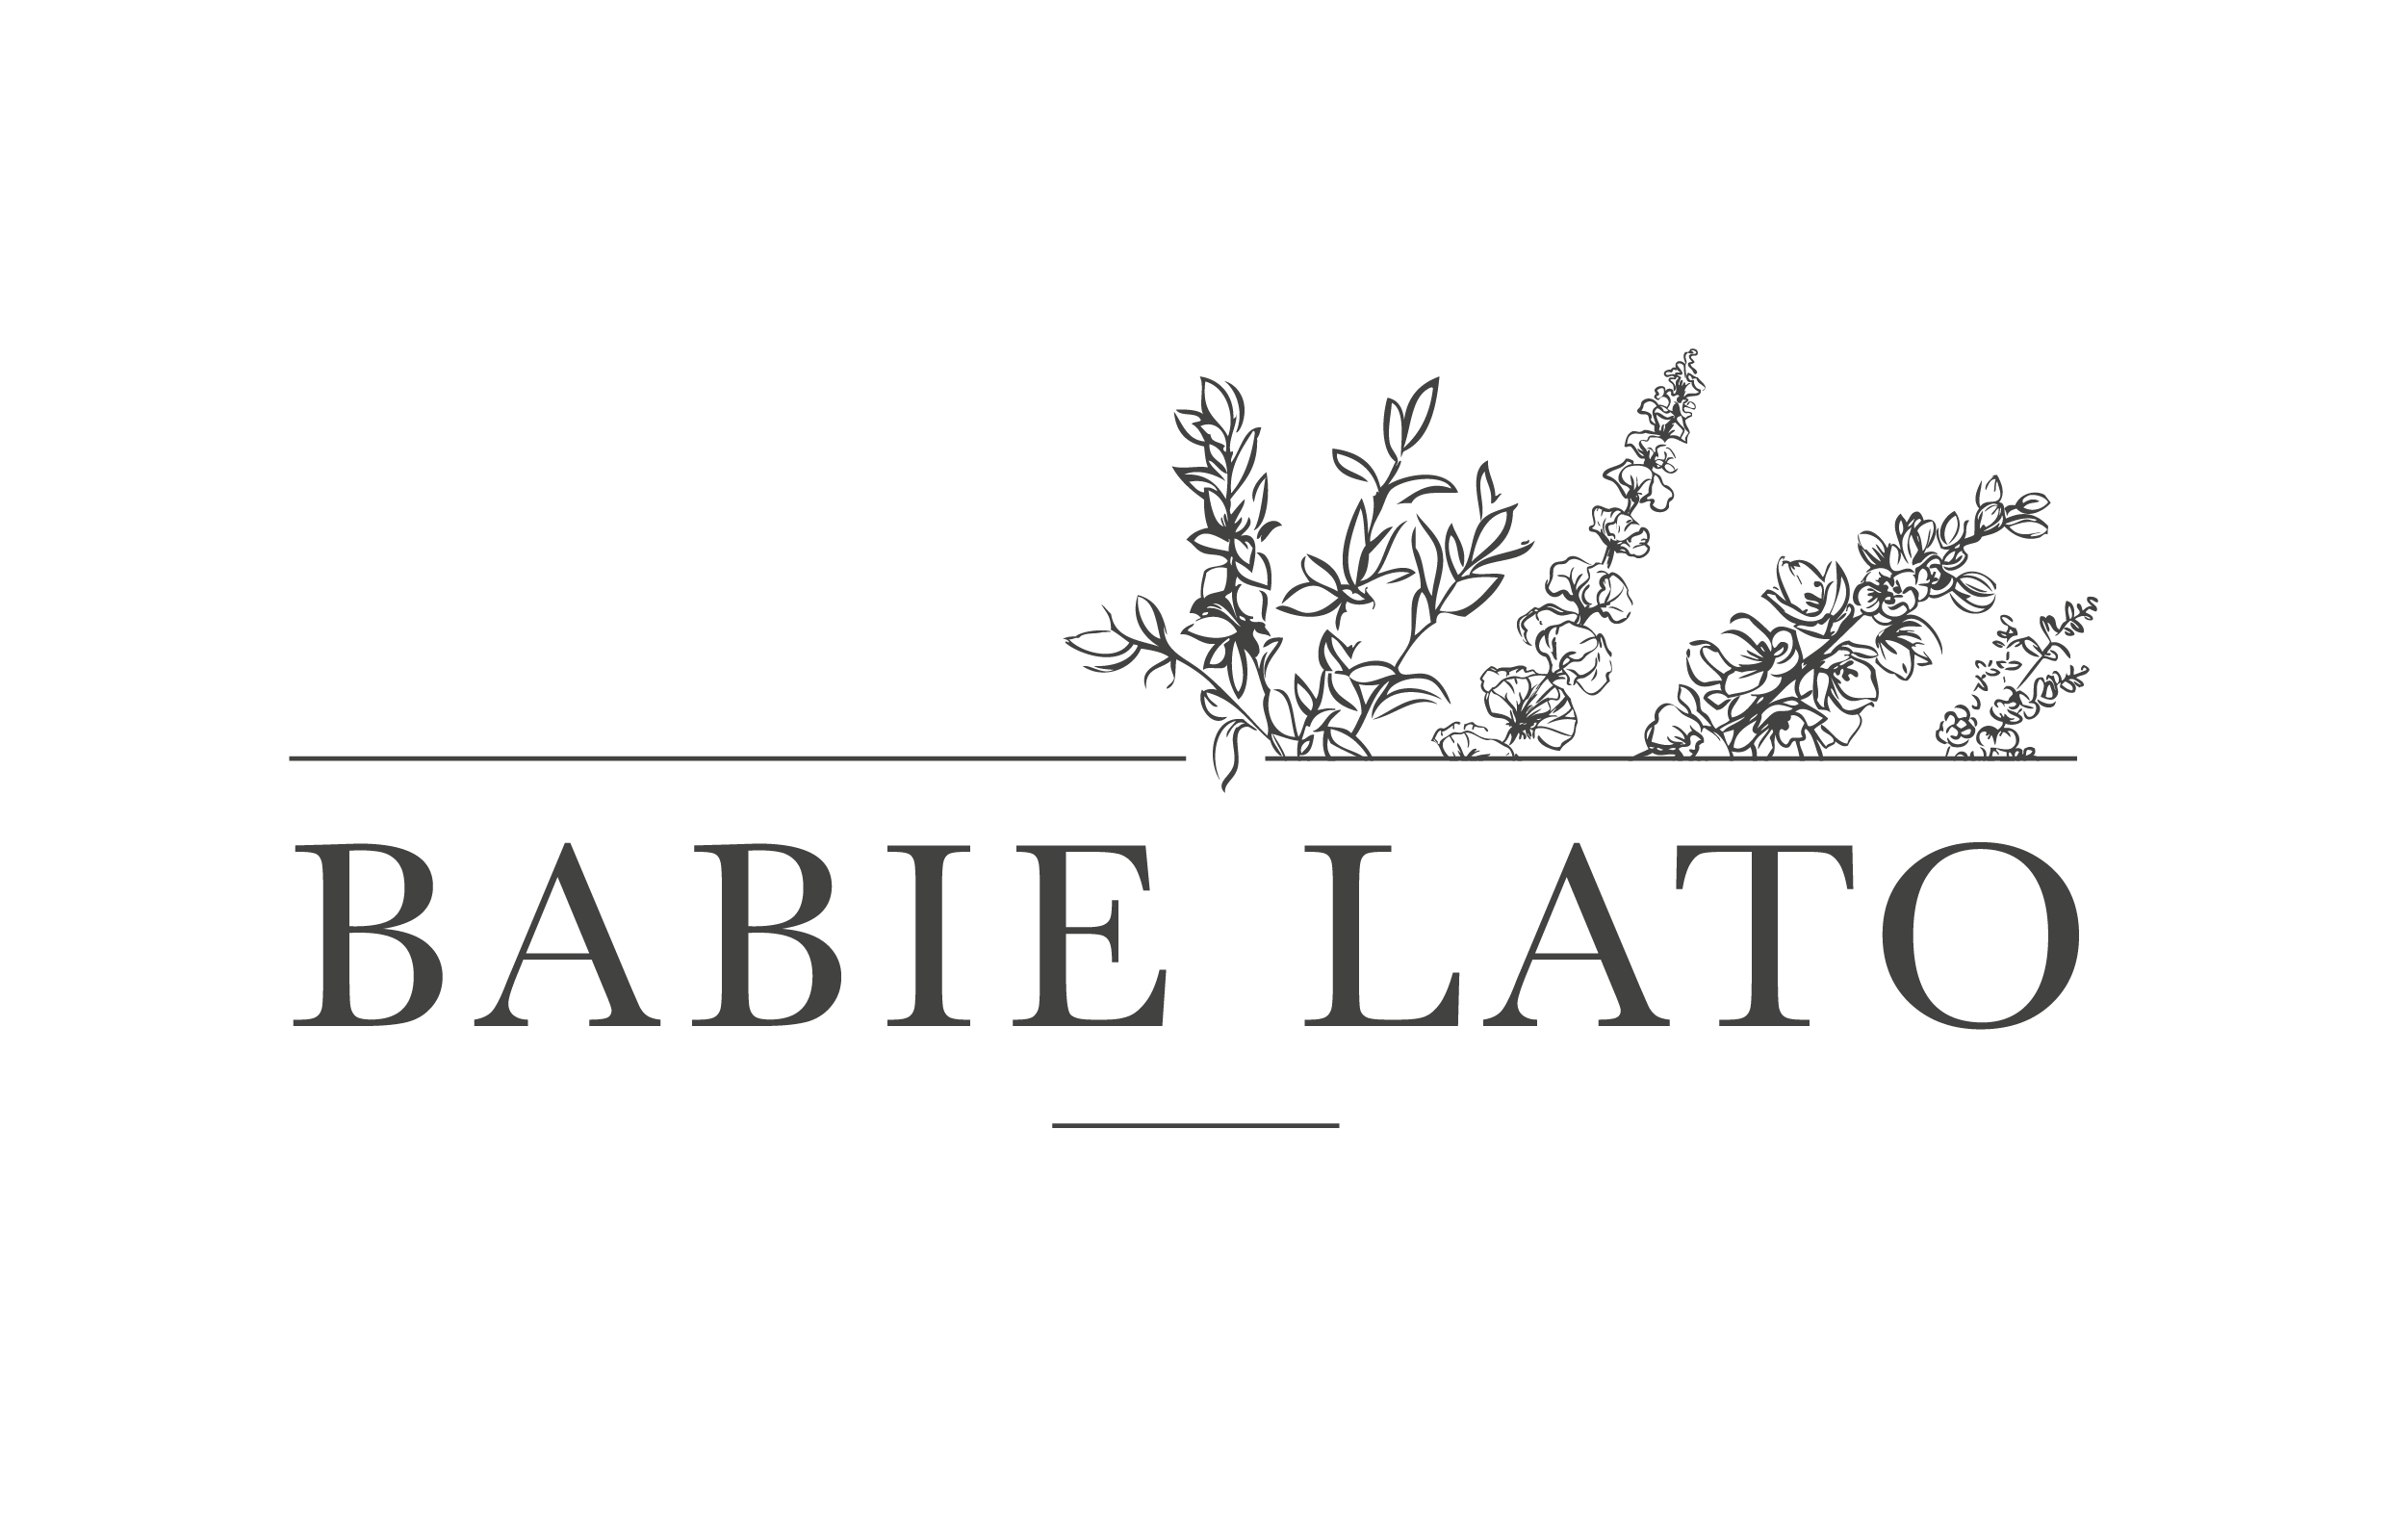 Babie Lato